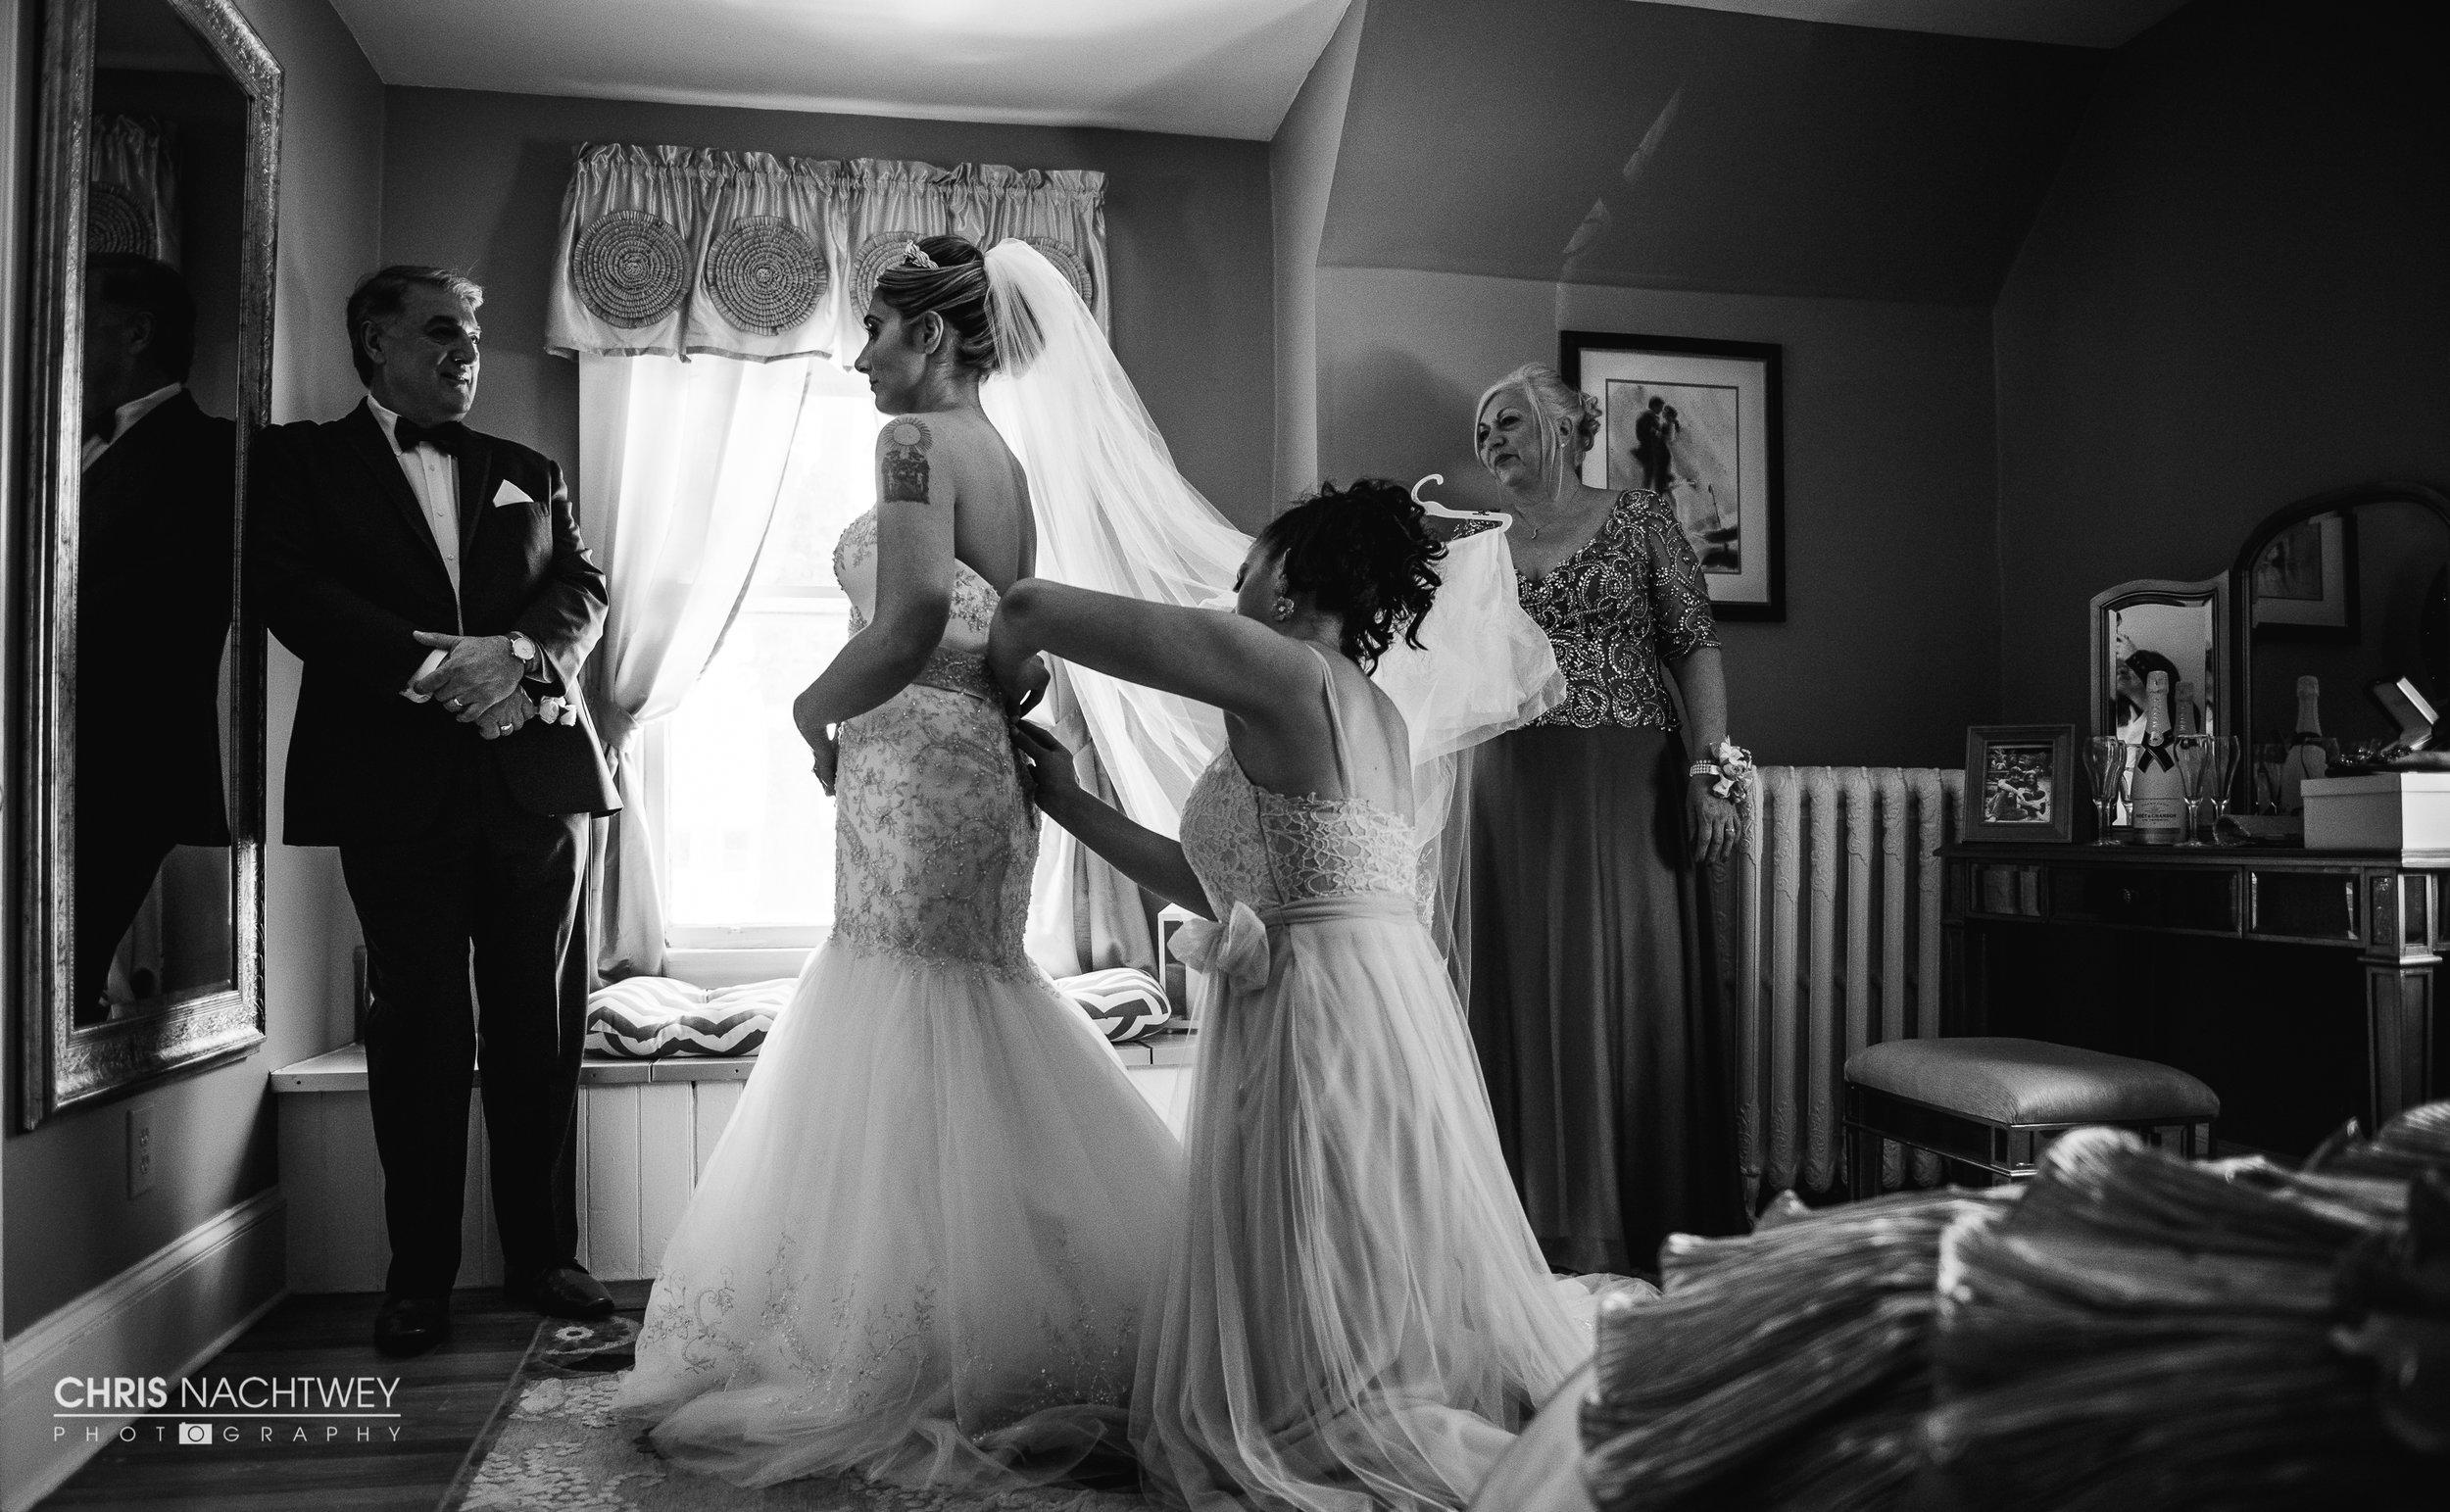 mystic-artistic-wedding-photographer-chris-nachtwey-2017-7.jpg